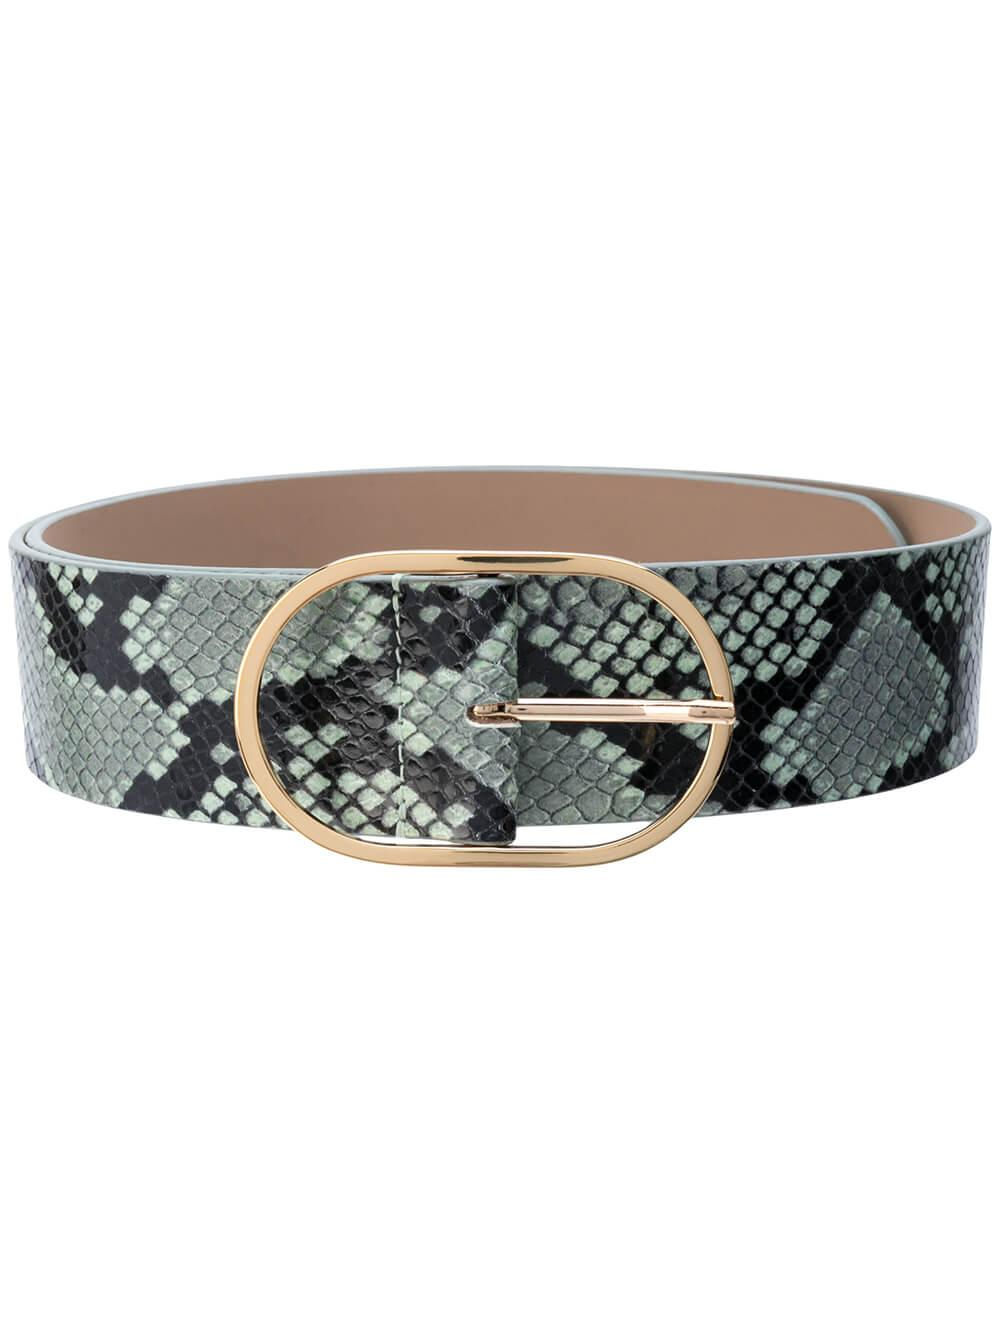 Emmie Python Hip Belt Item # BH515-700LE